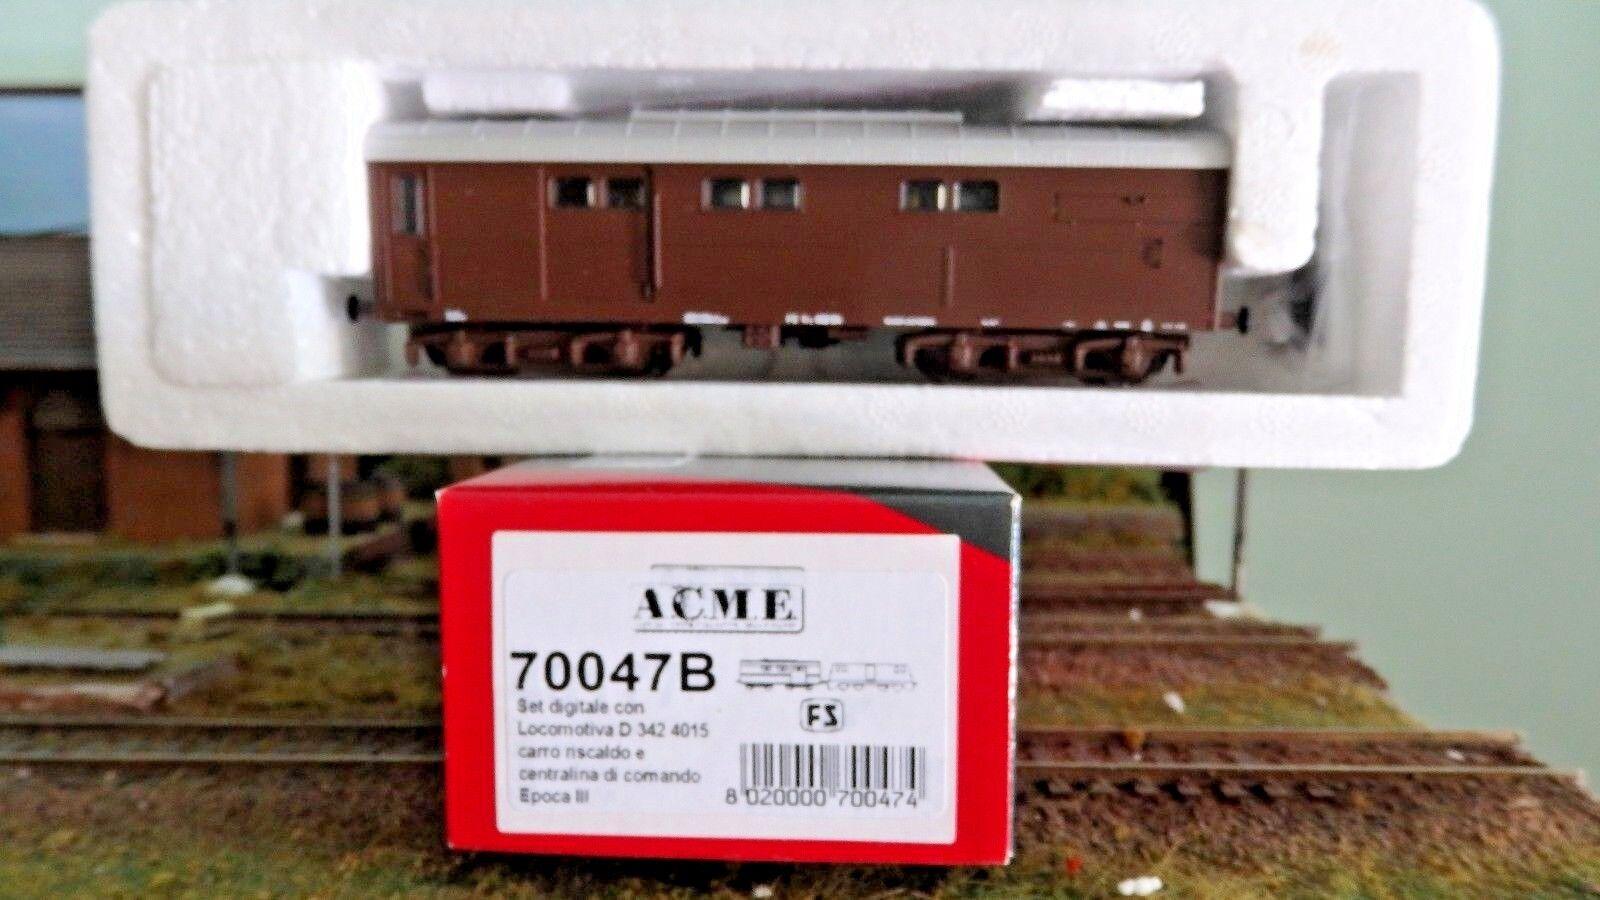 ACME 70047b Wagon reheating VRZ braun, DCC, Disp. Smoke,